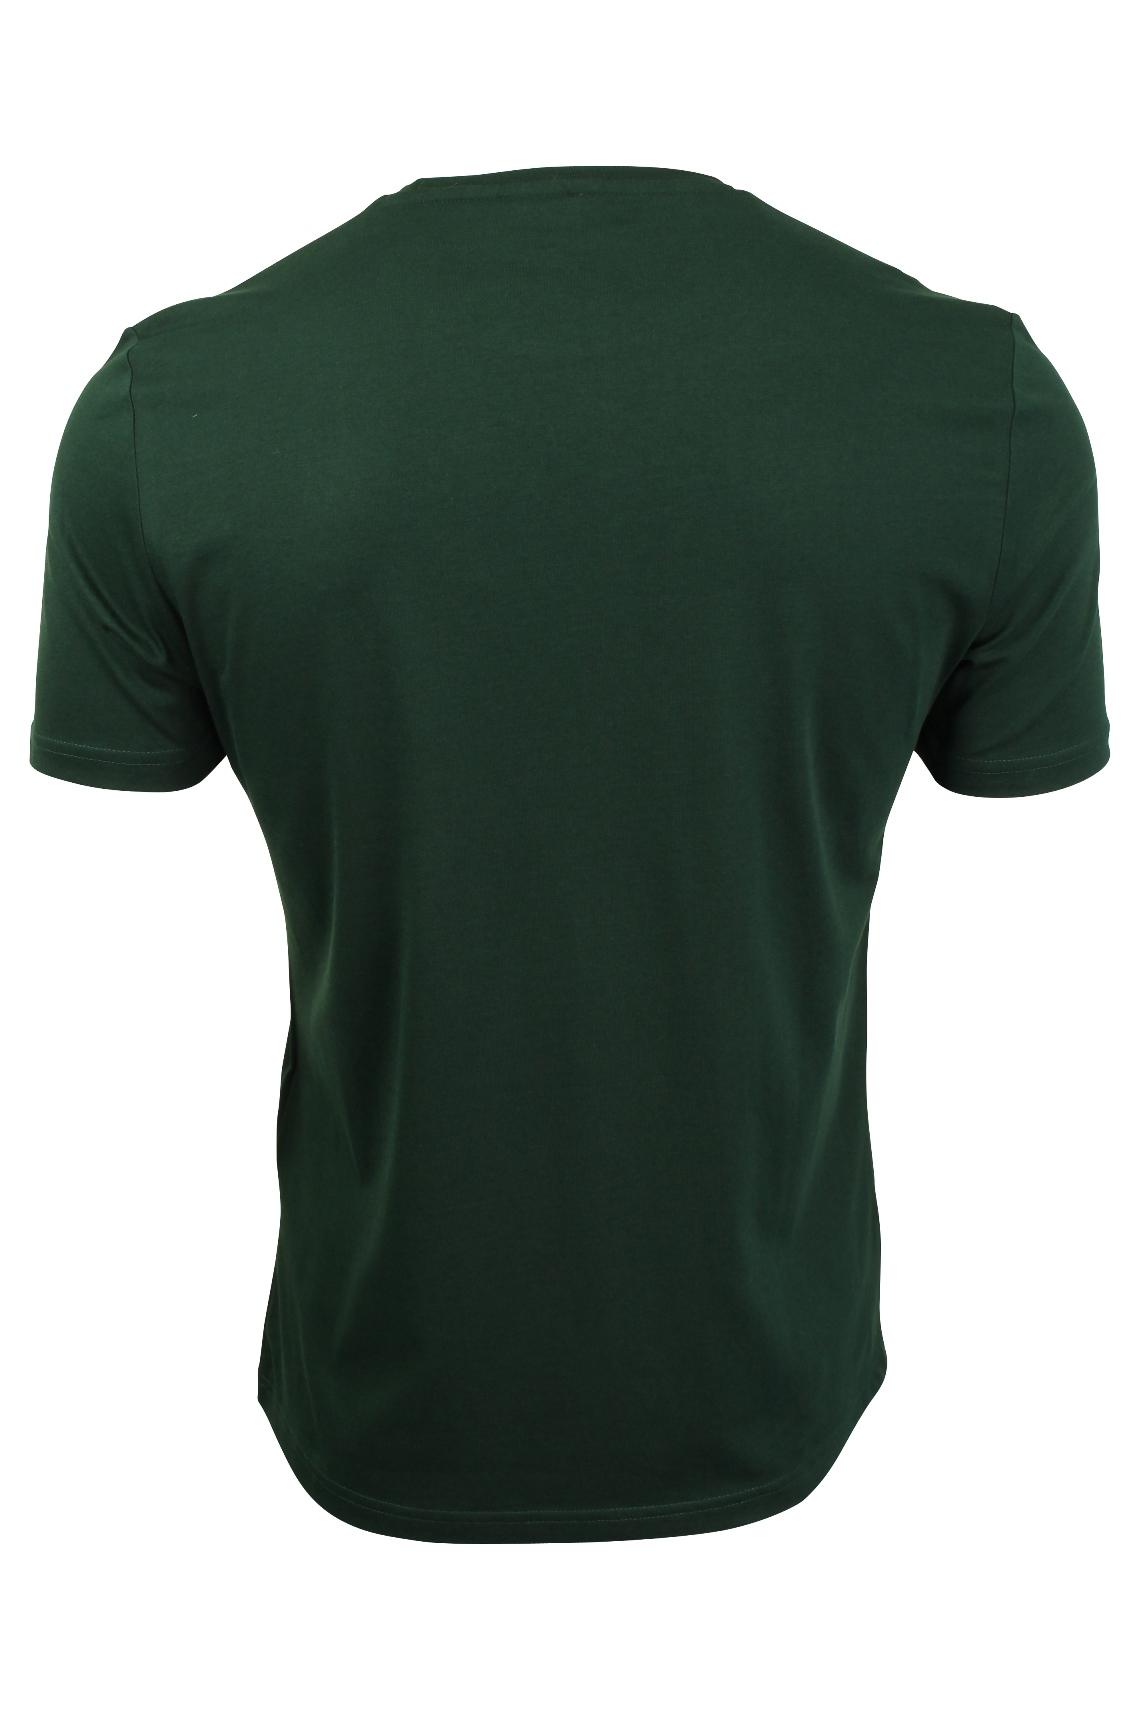 Mens-Classic-Spade-Pocket-T-Shirt-by-Ben-Sherman thumbnail 16